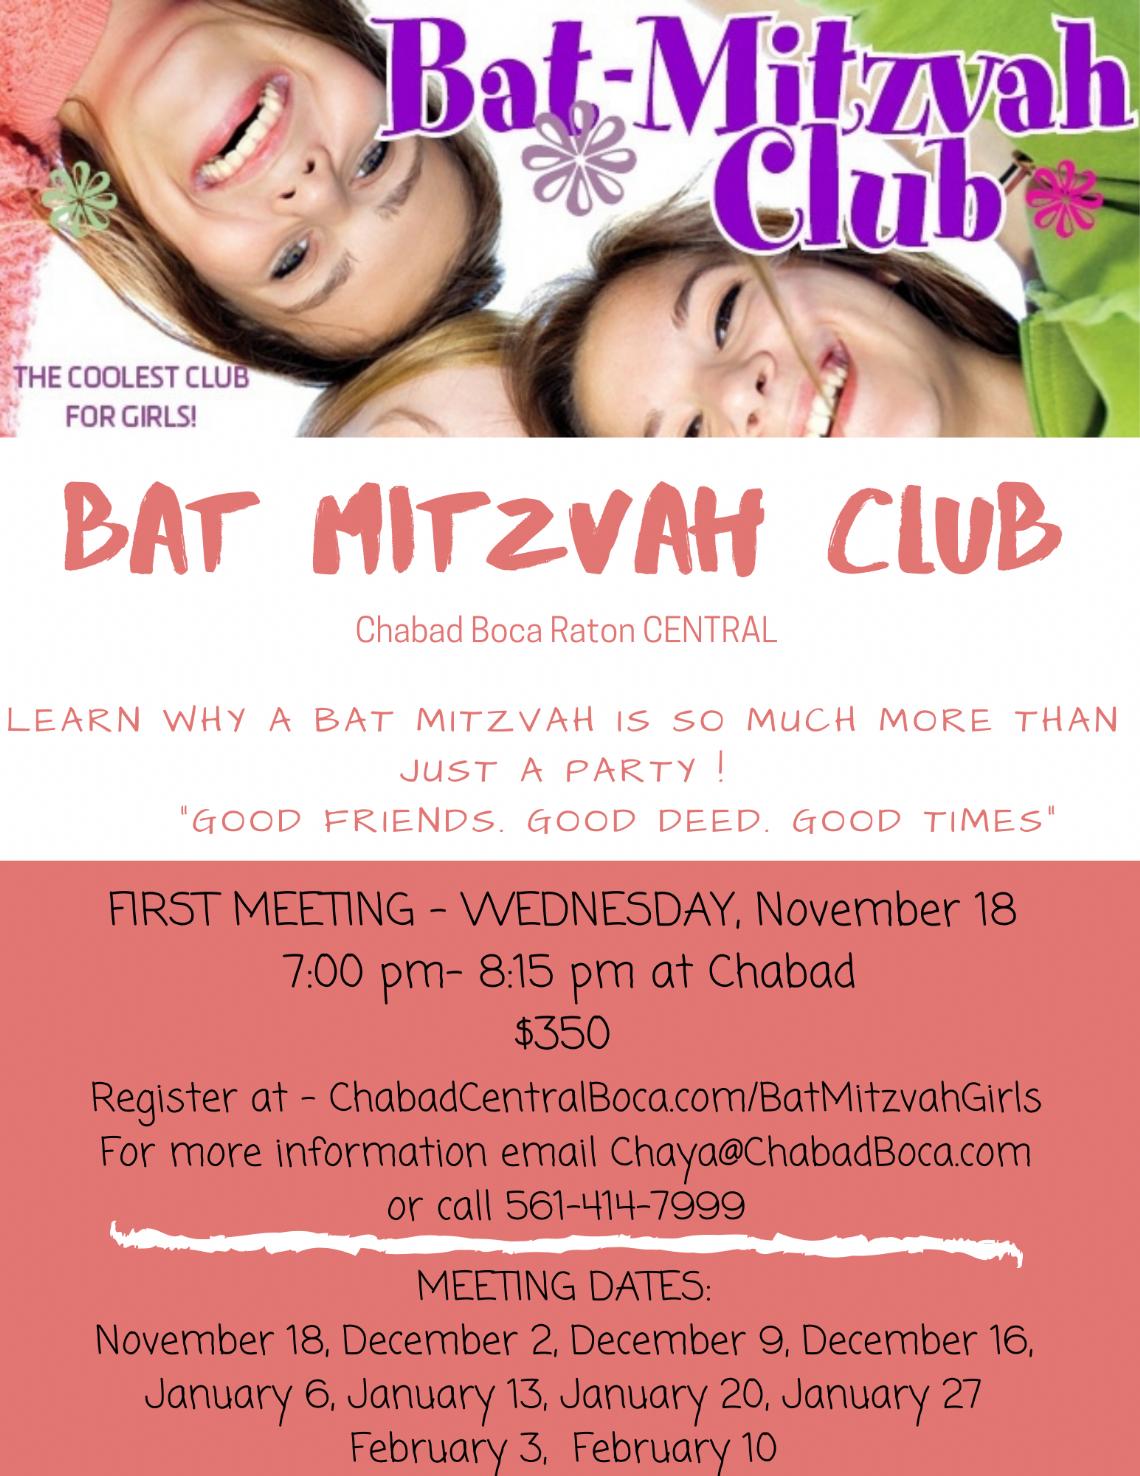 2020 BAT MITZVAH CLUB flyer size.png